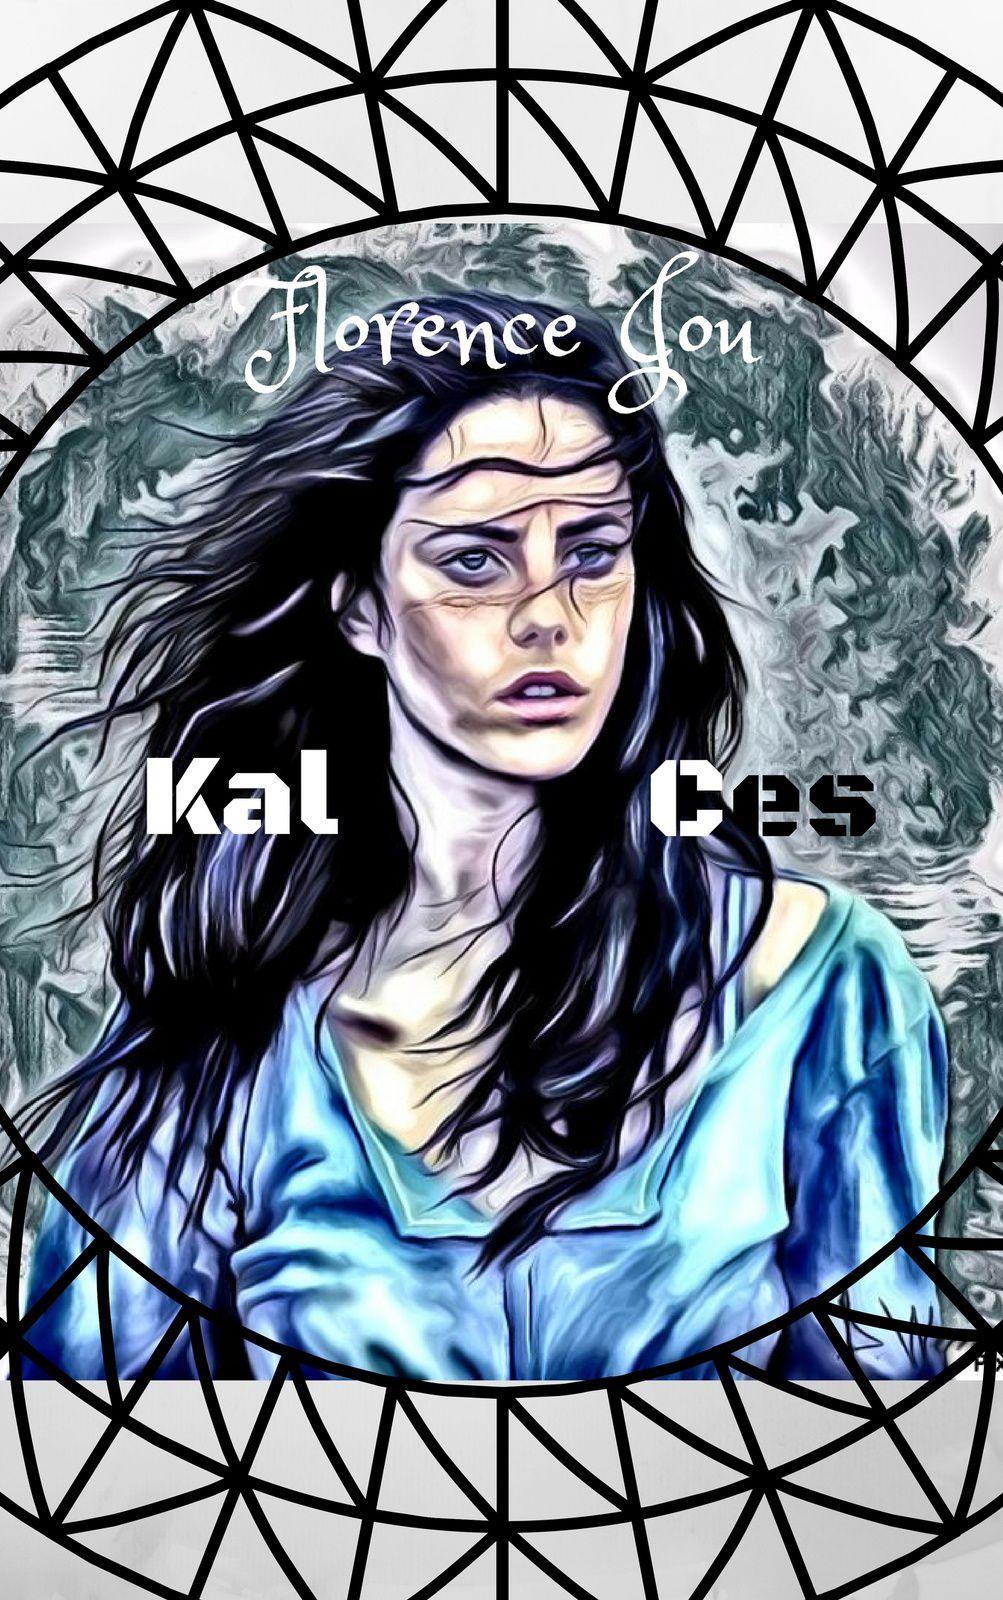 Couvertures - Florence Jou